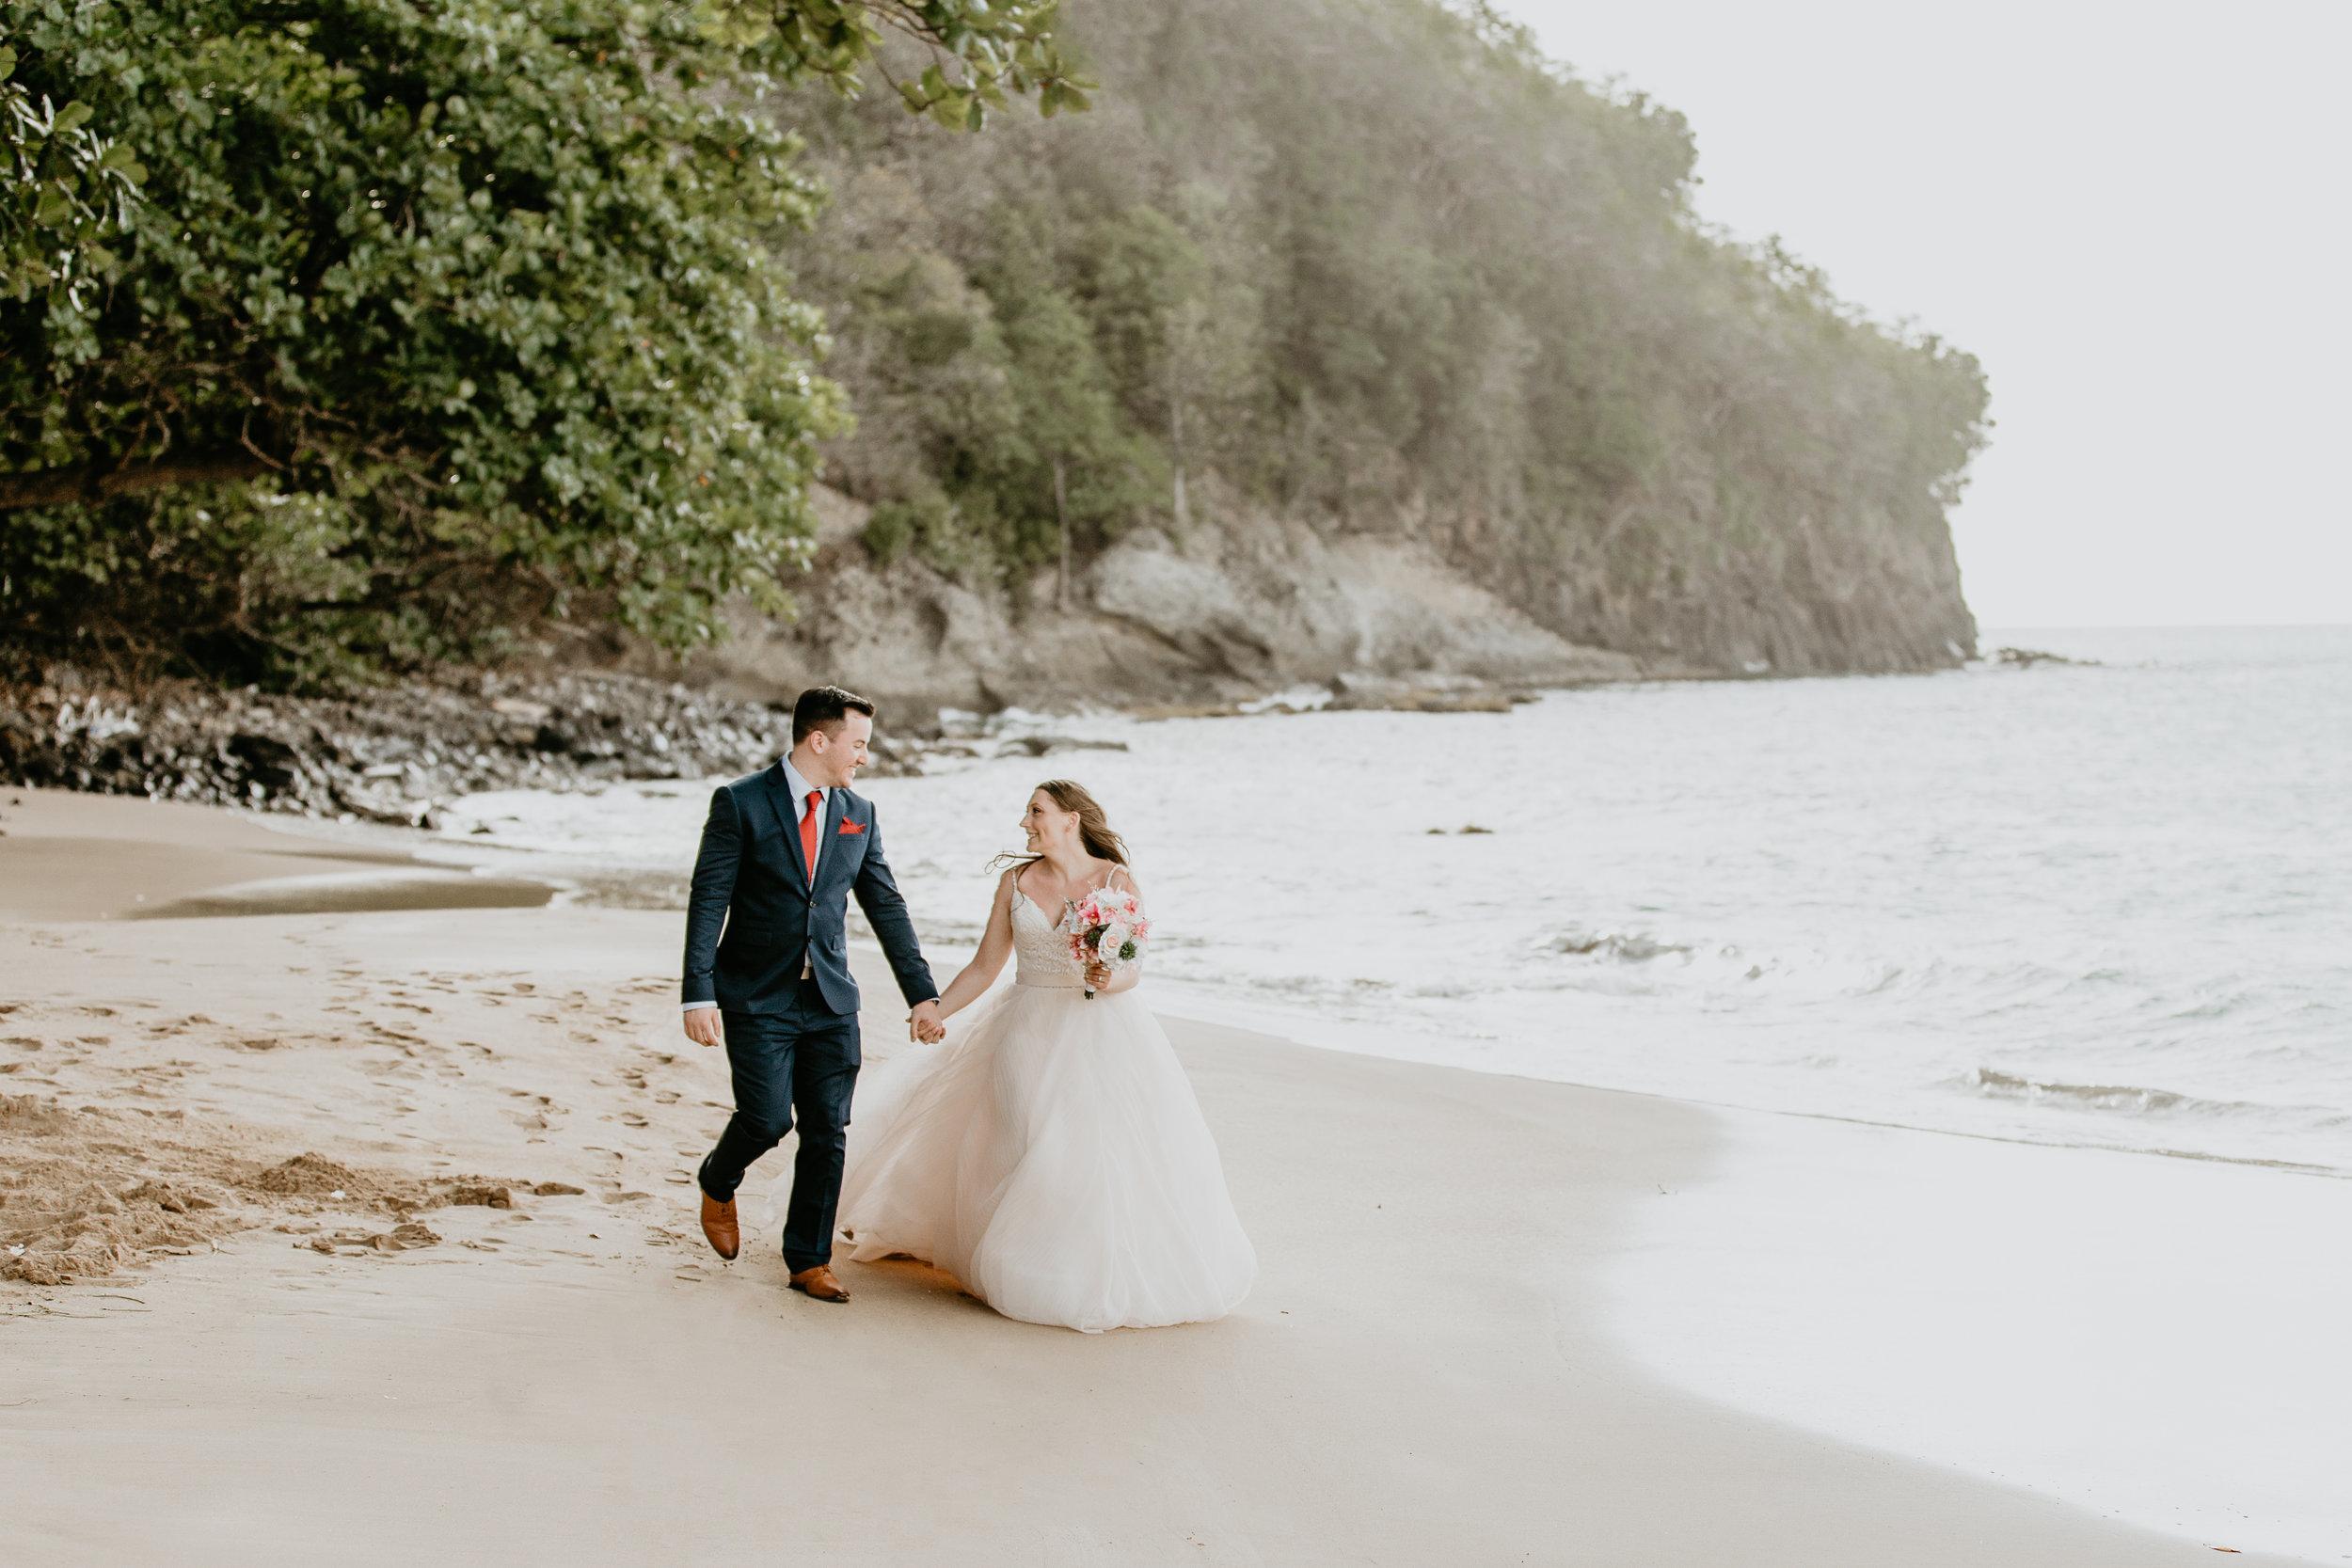 nicole-daacke-photography-destination-wedding-in-st-lucia-sandals-la-toc-intimate-island-wedding-carribean-elopement-photographer-chill-island-wedding-82.jpg